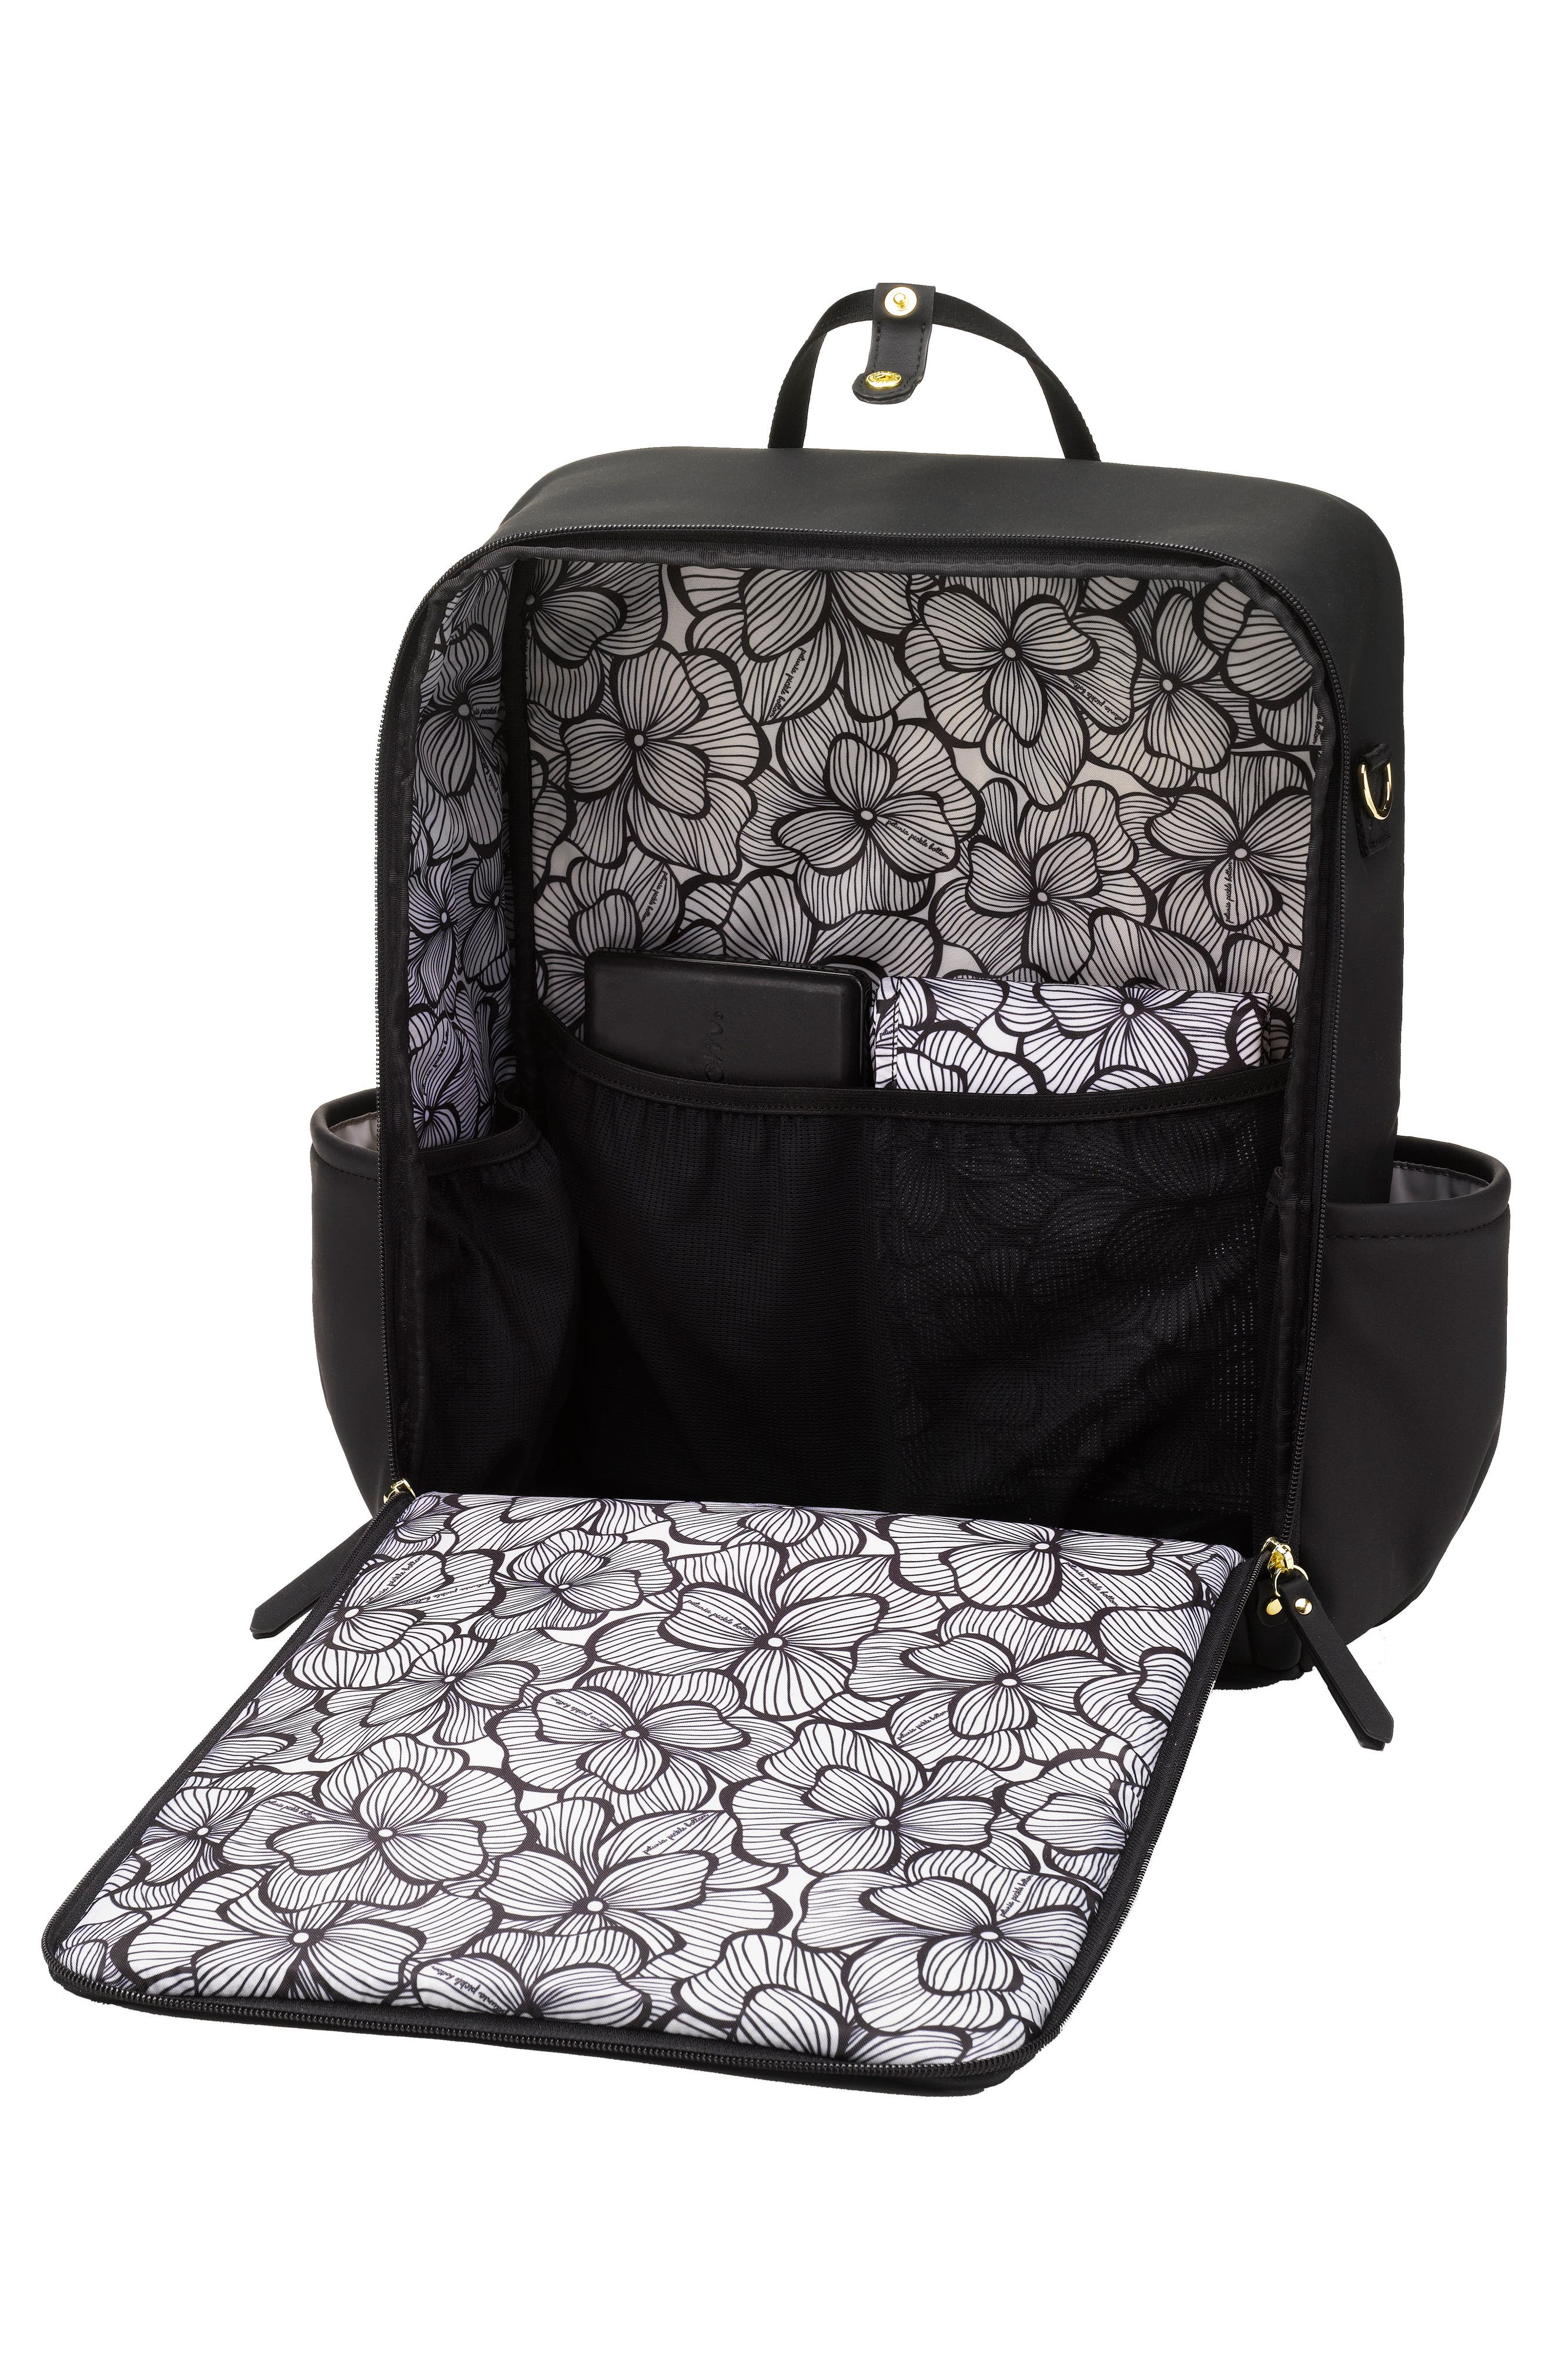 Balance Backpack Diaper Bag,                             Alternate thumbnail 4, color,                             Black Matte Leatherette